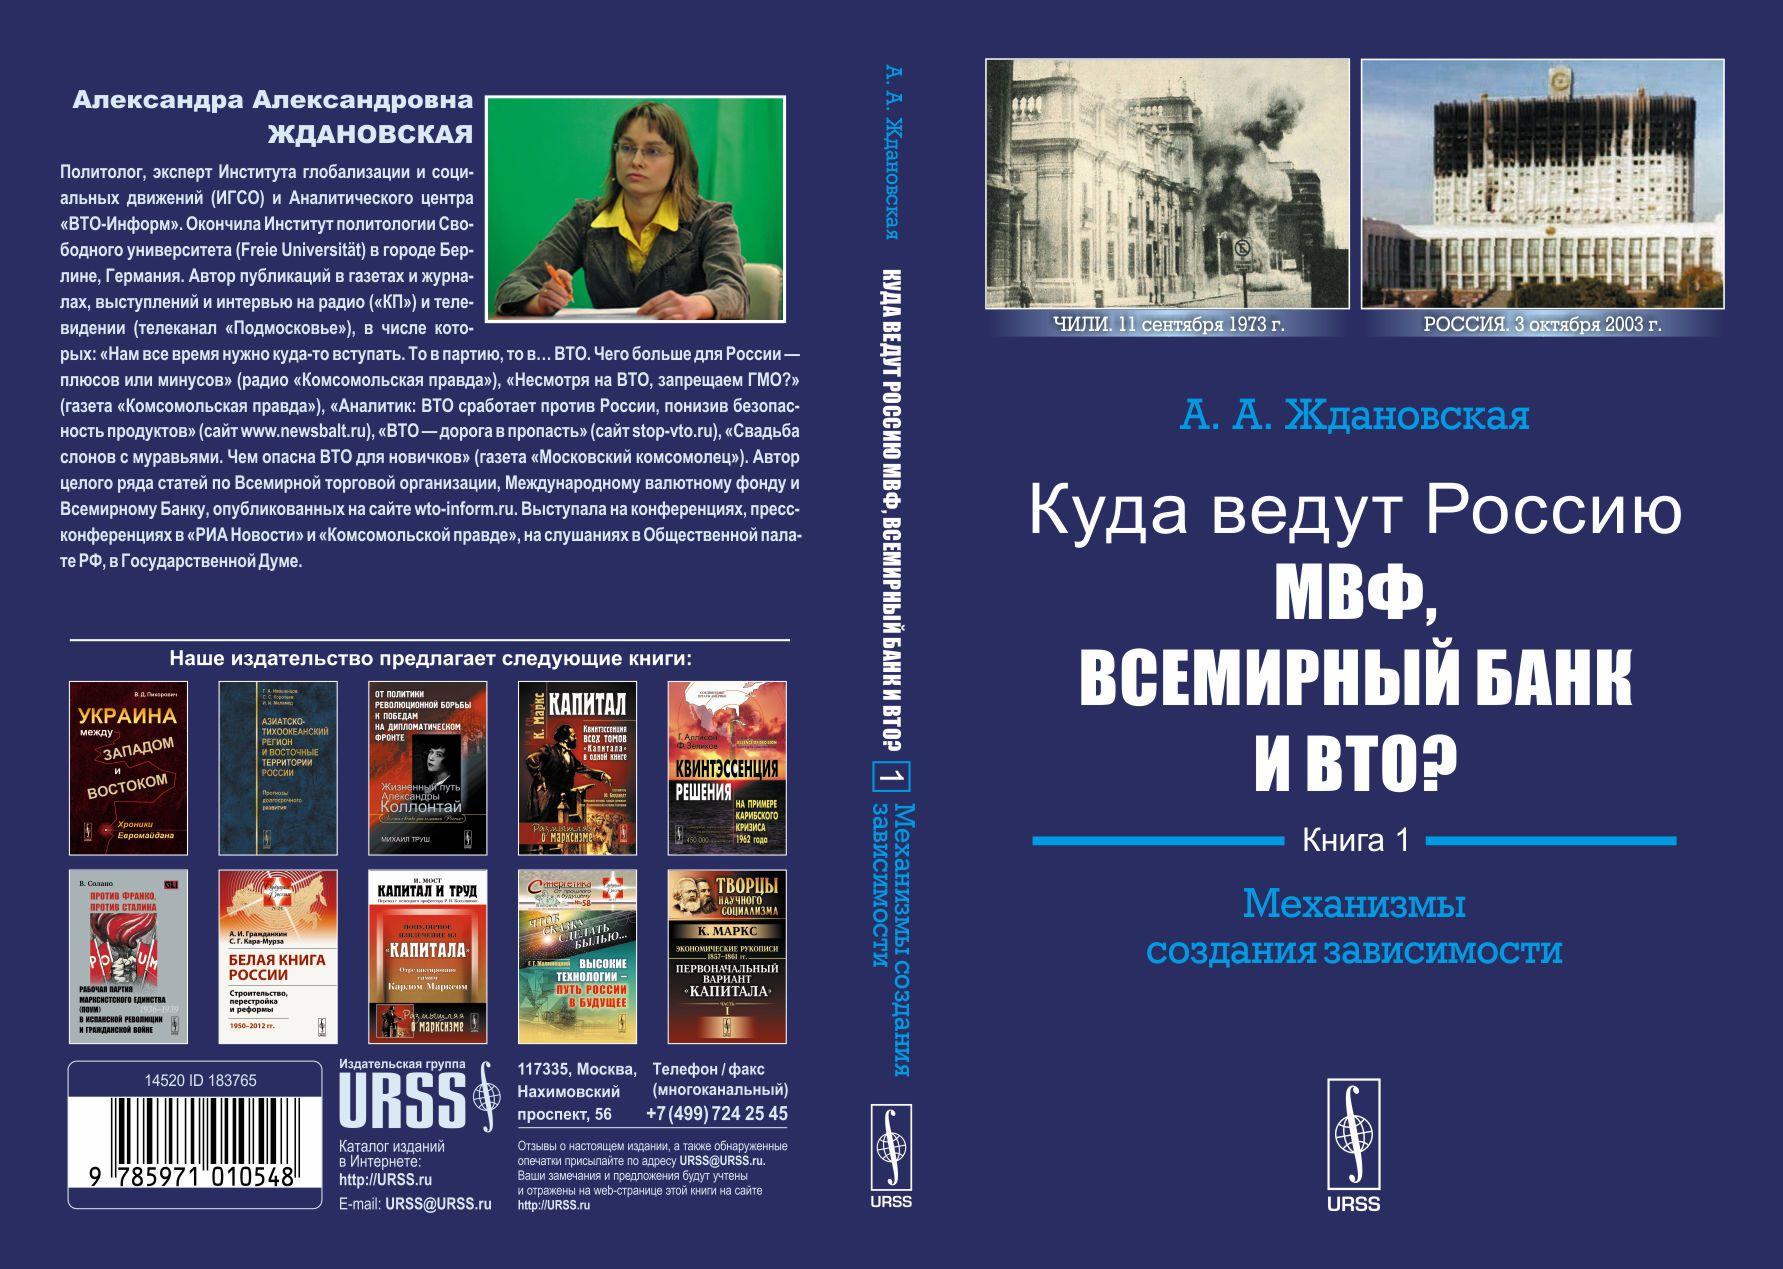 ZhdanovskaiaAA.14520-cover